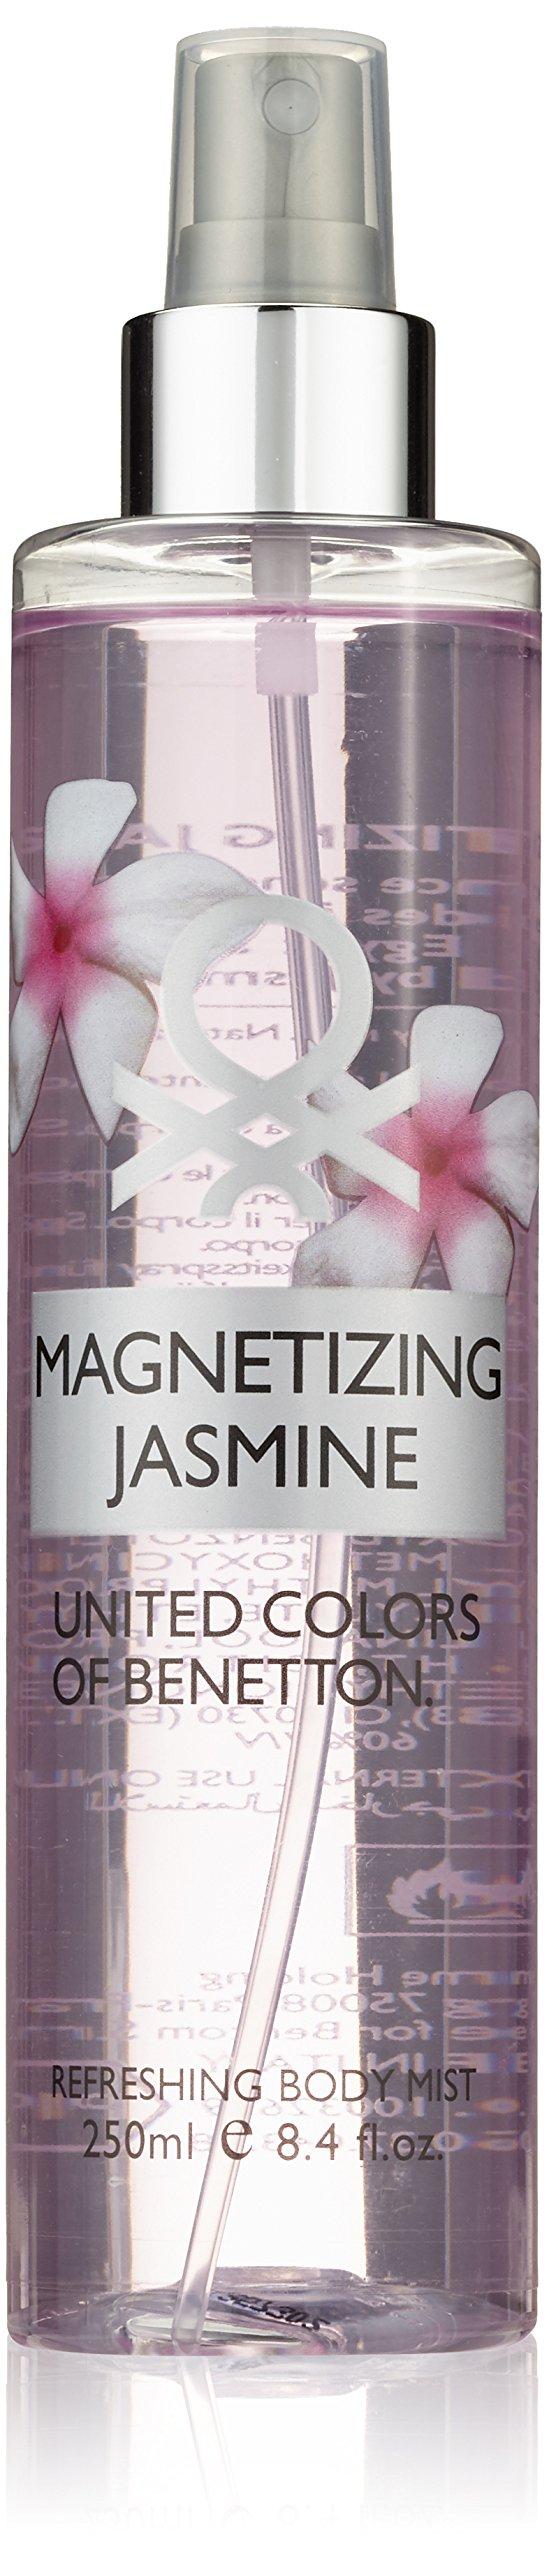 United Colors of Benetton Magnetizing Jasmine Body Mist, 8.4 Ounce by United Colors of Benetton (Image #1)